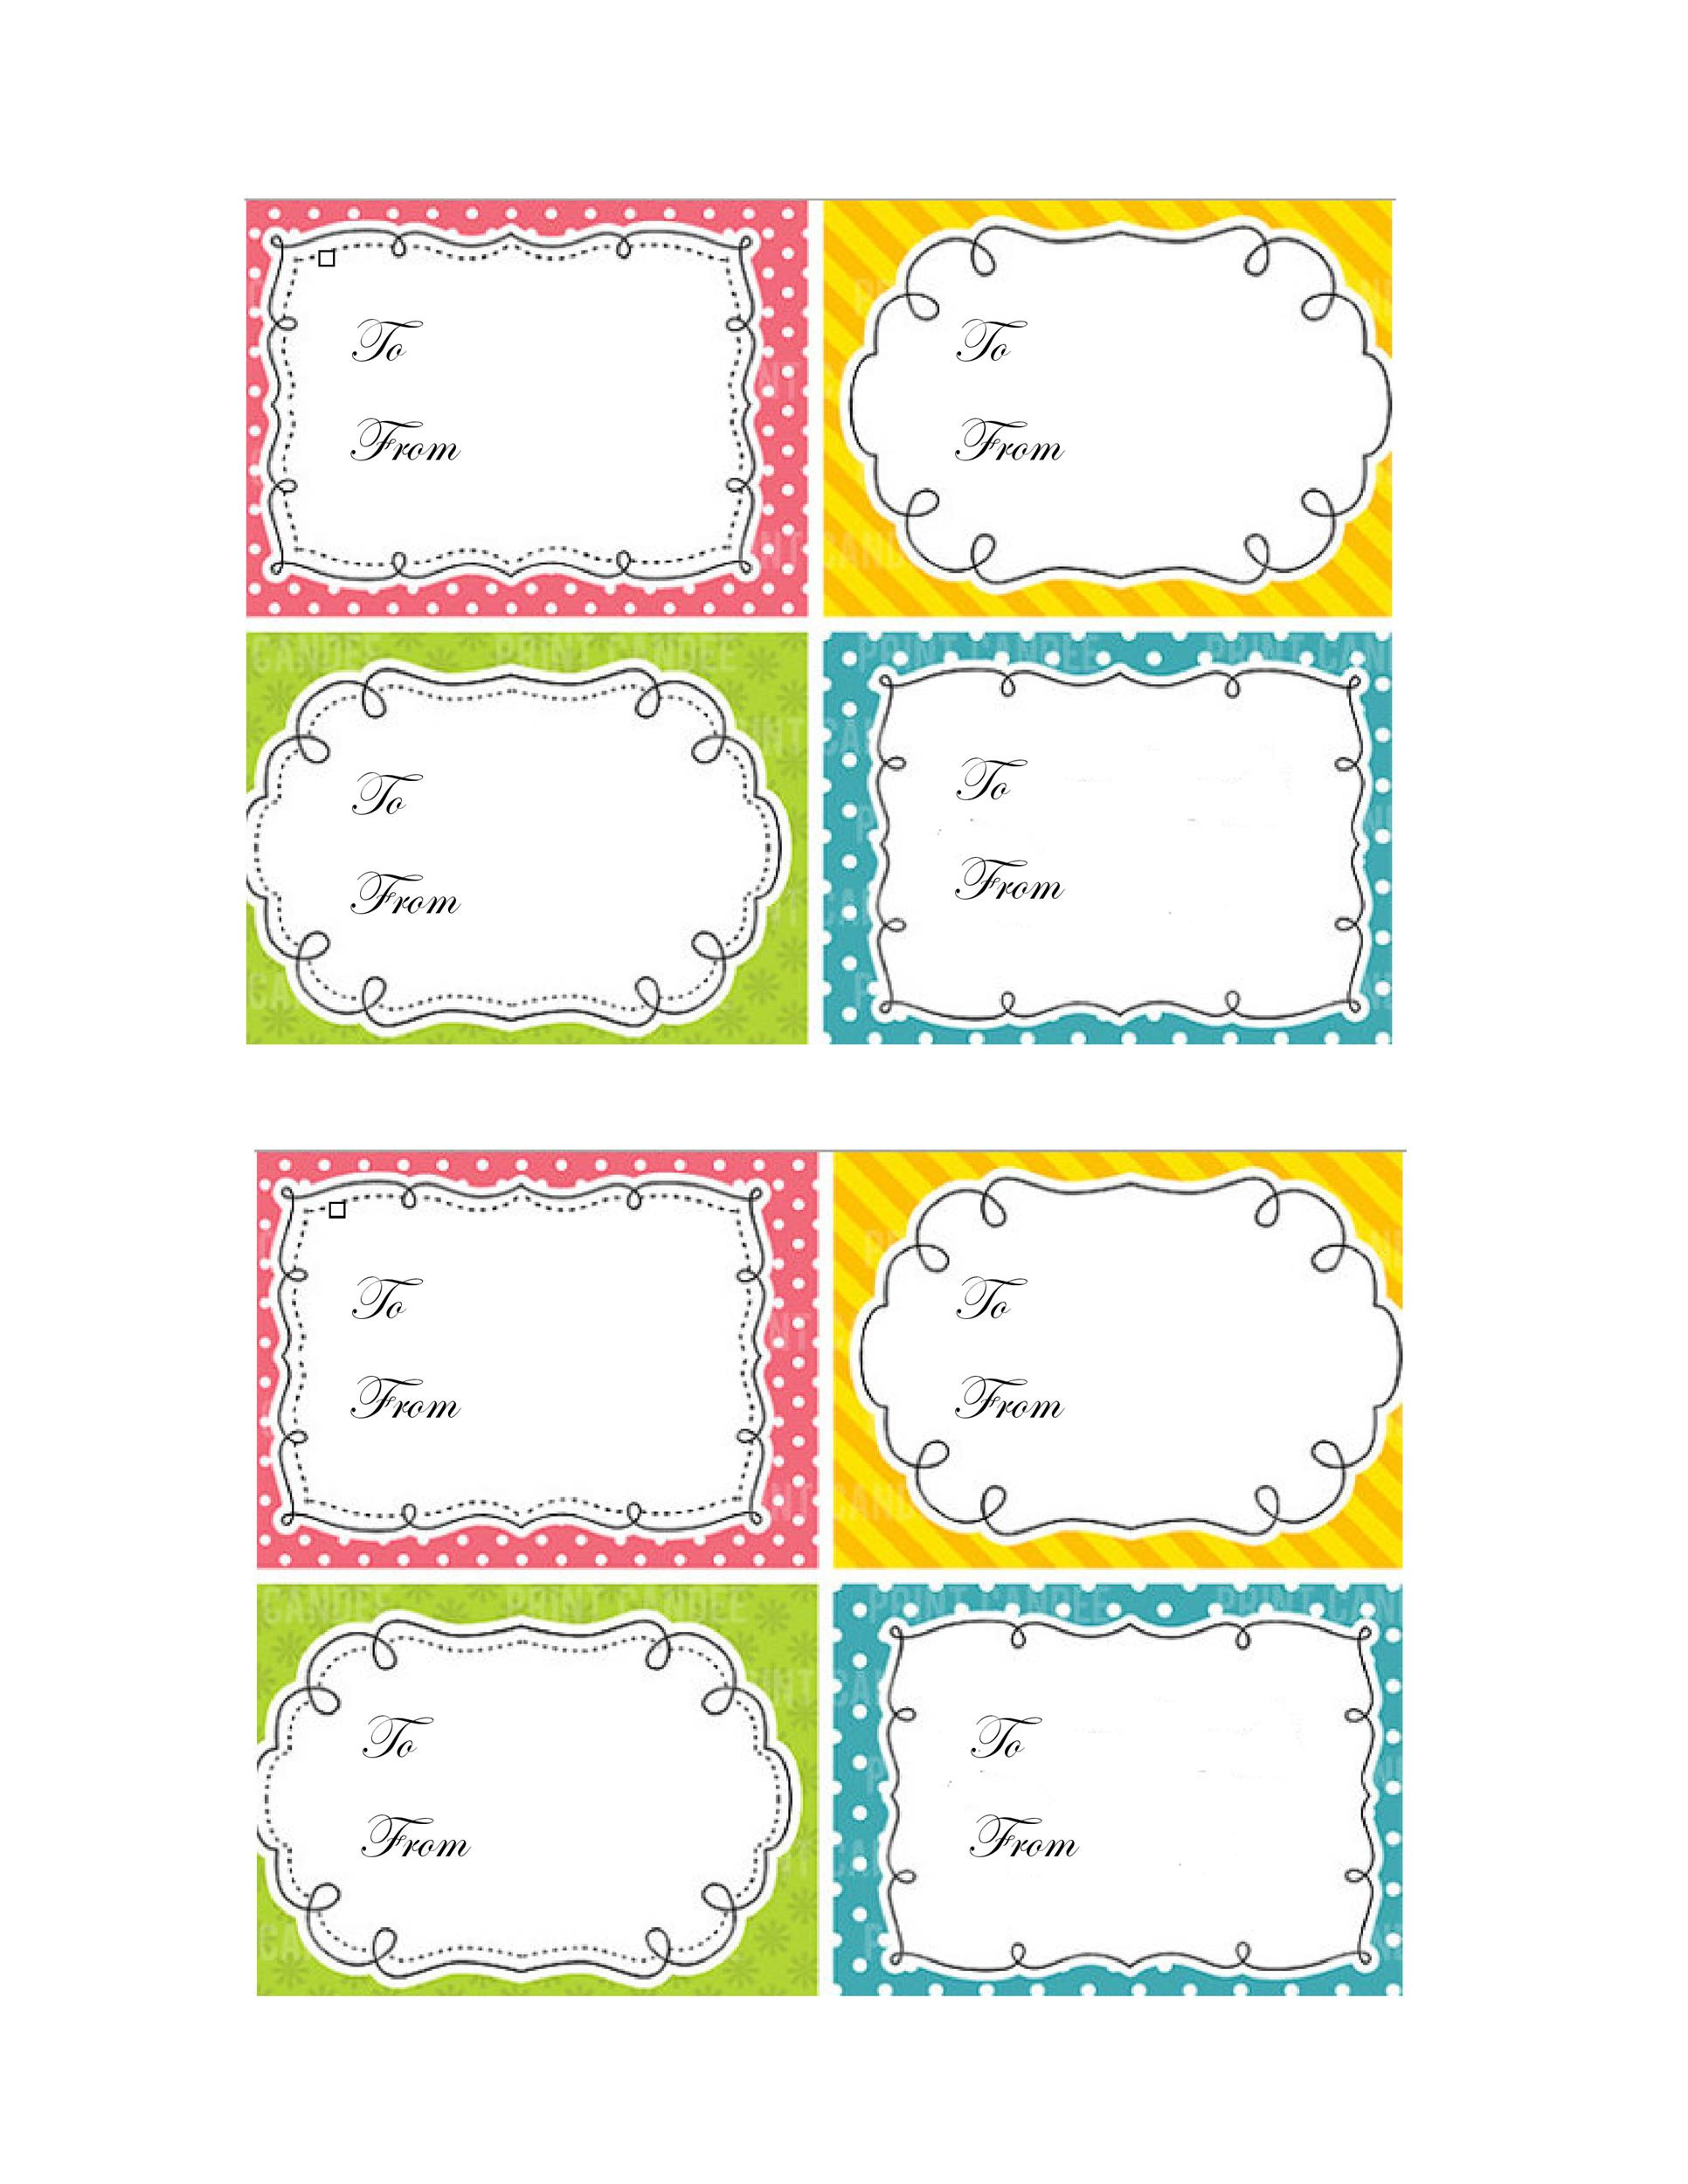 44 Free Printable Gift Tag Templates ᐅ Template Lab